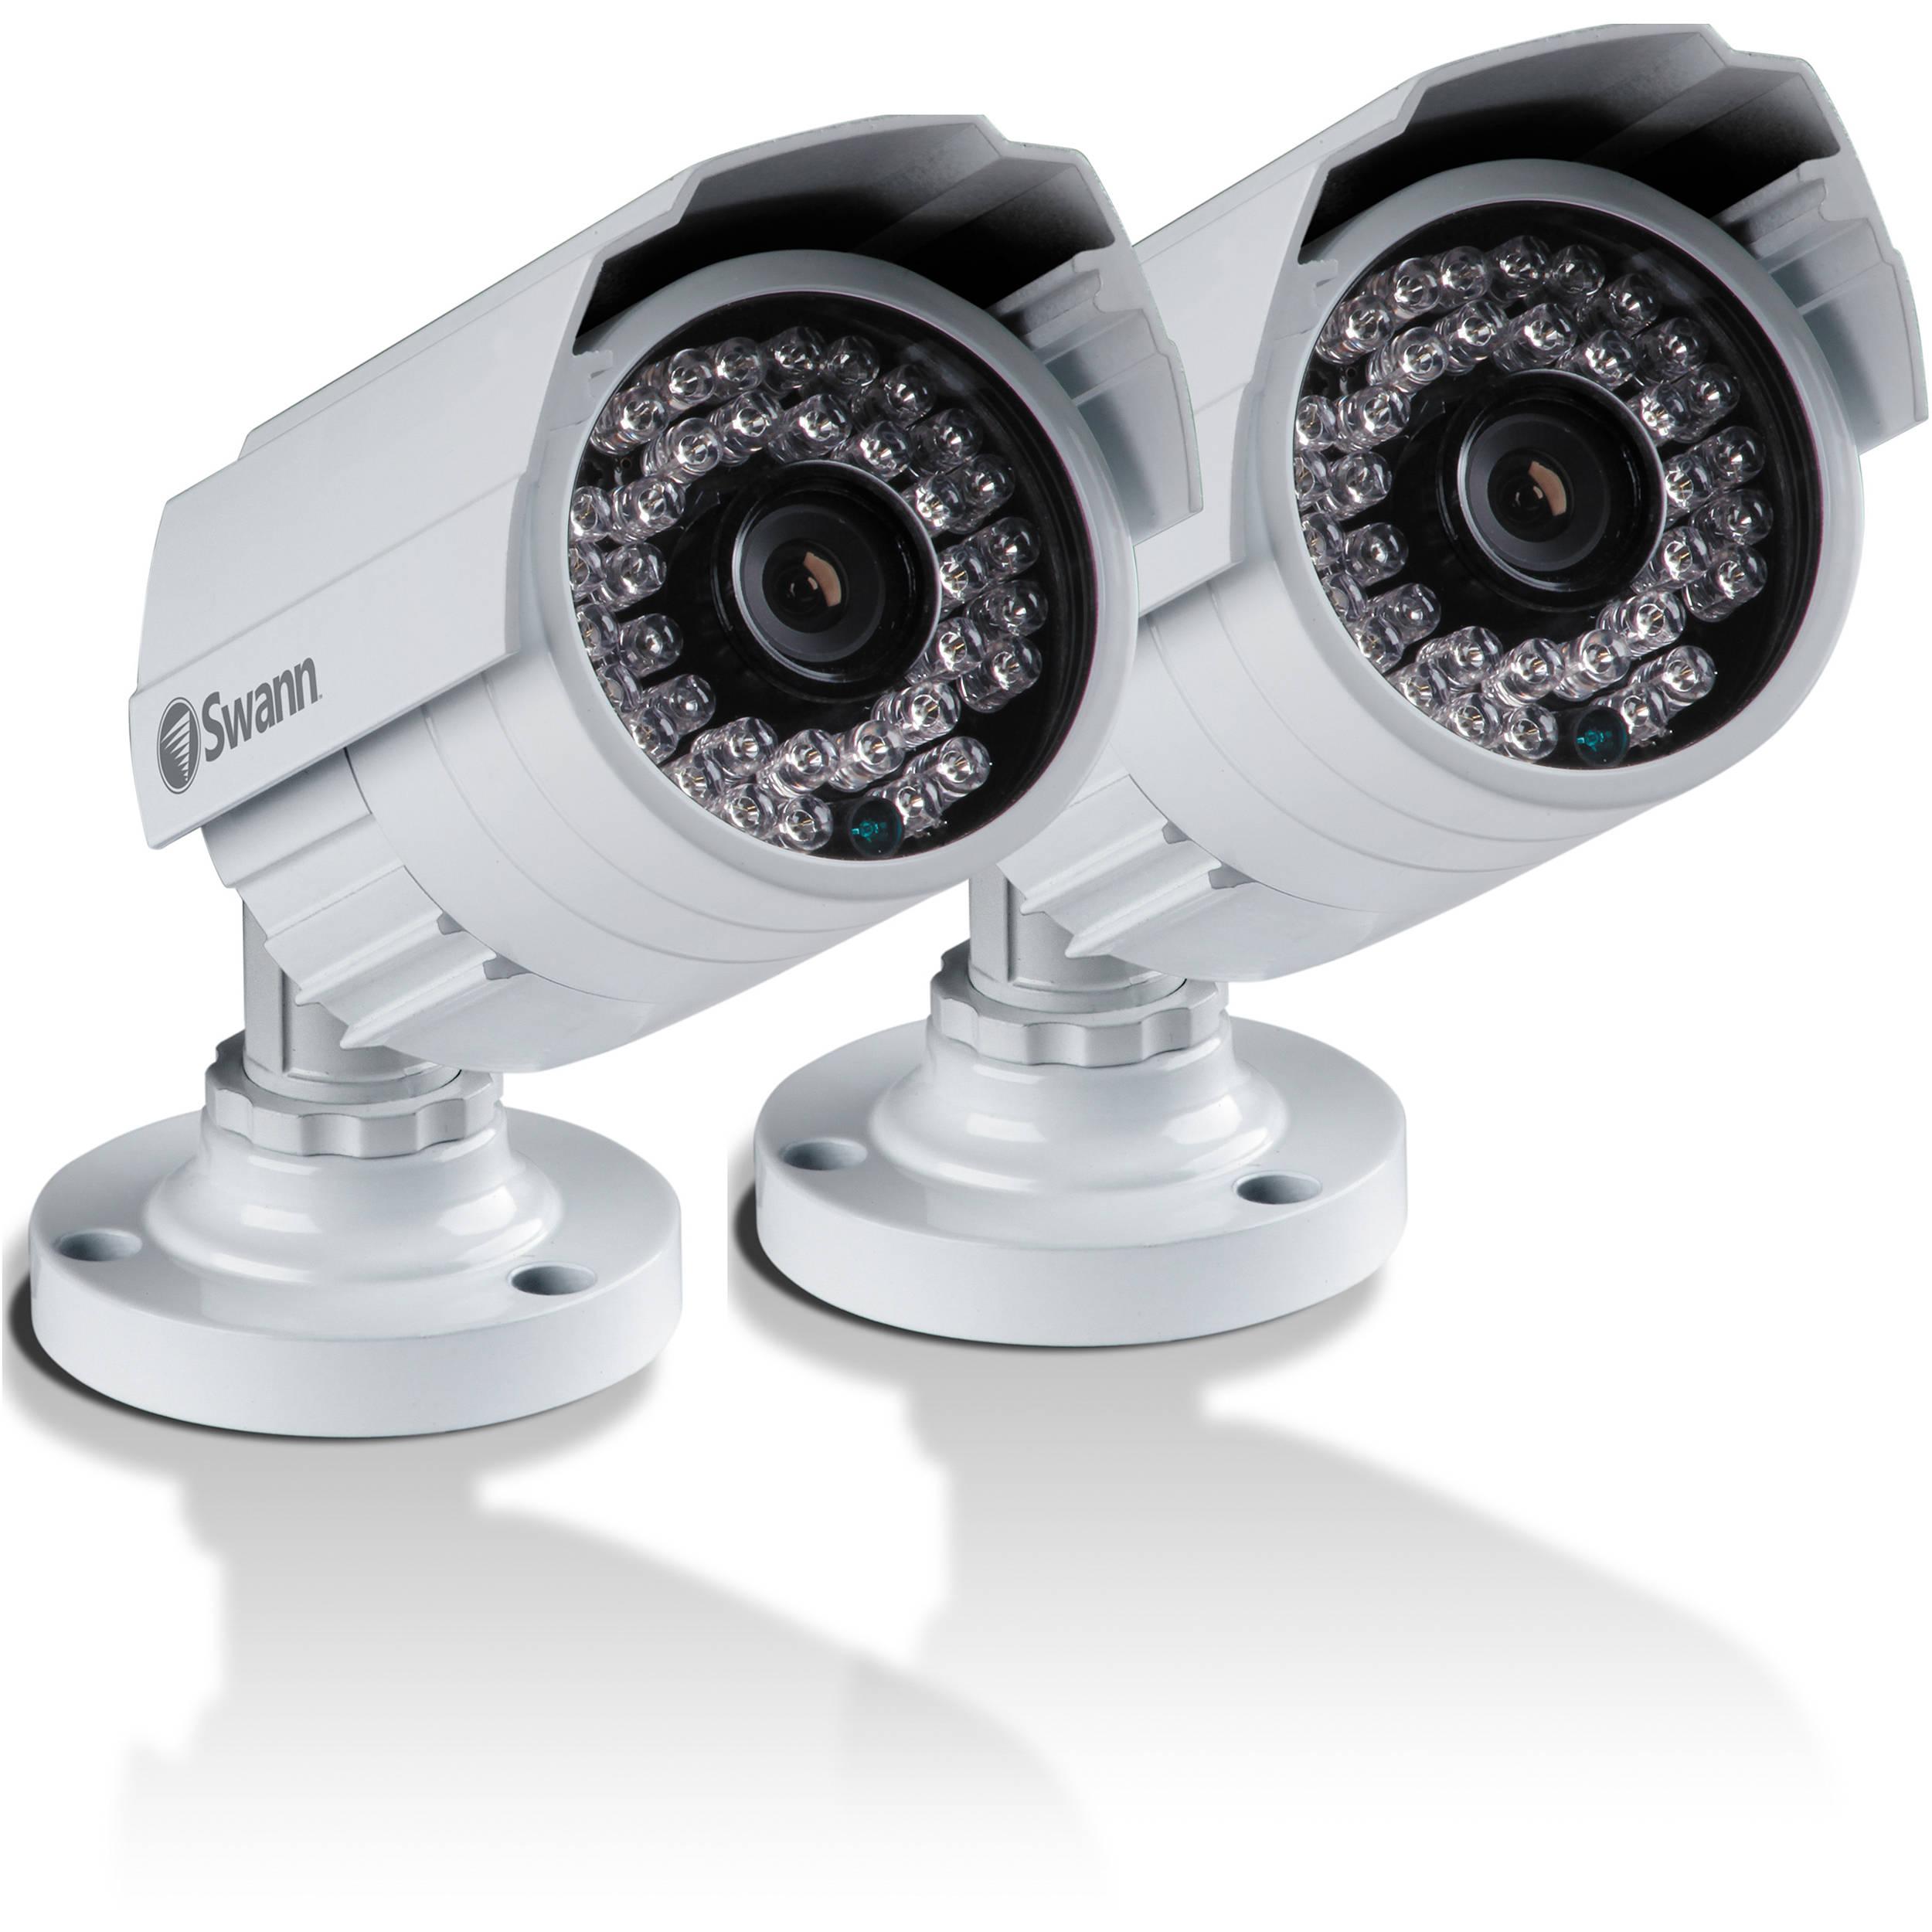 Swann Multi-Purpose Day / Night Security Cameras SWPRO-642PK2-US